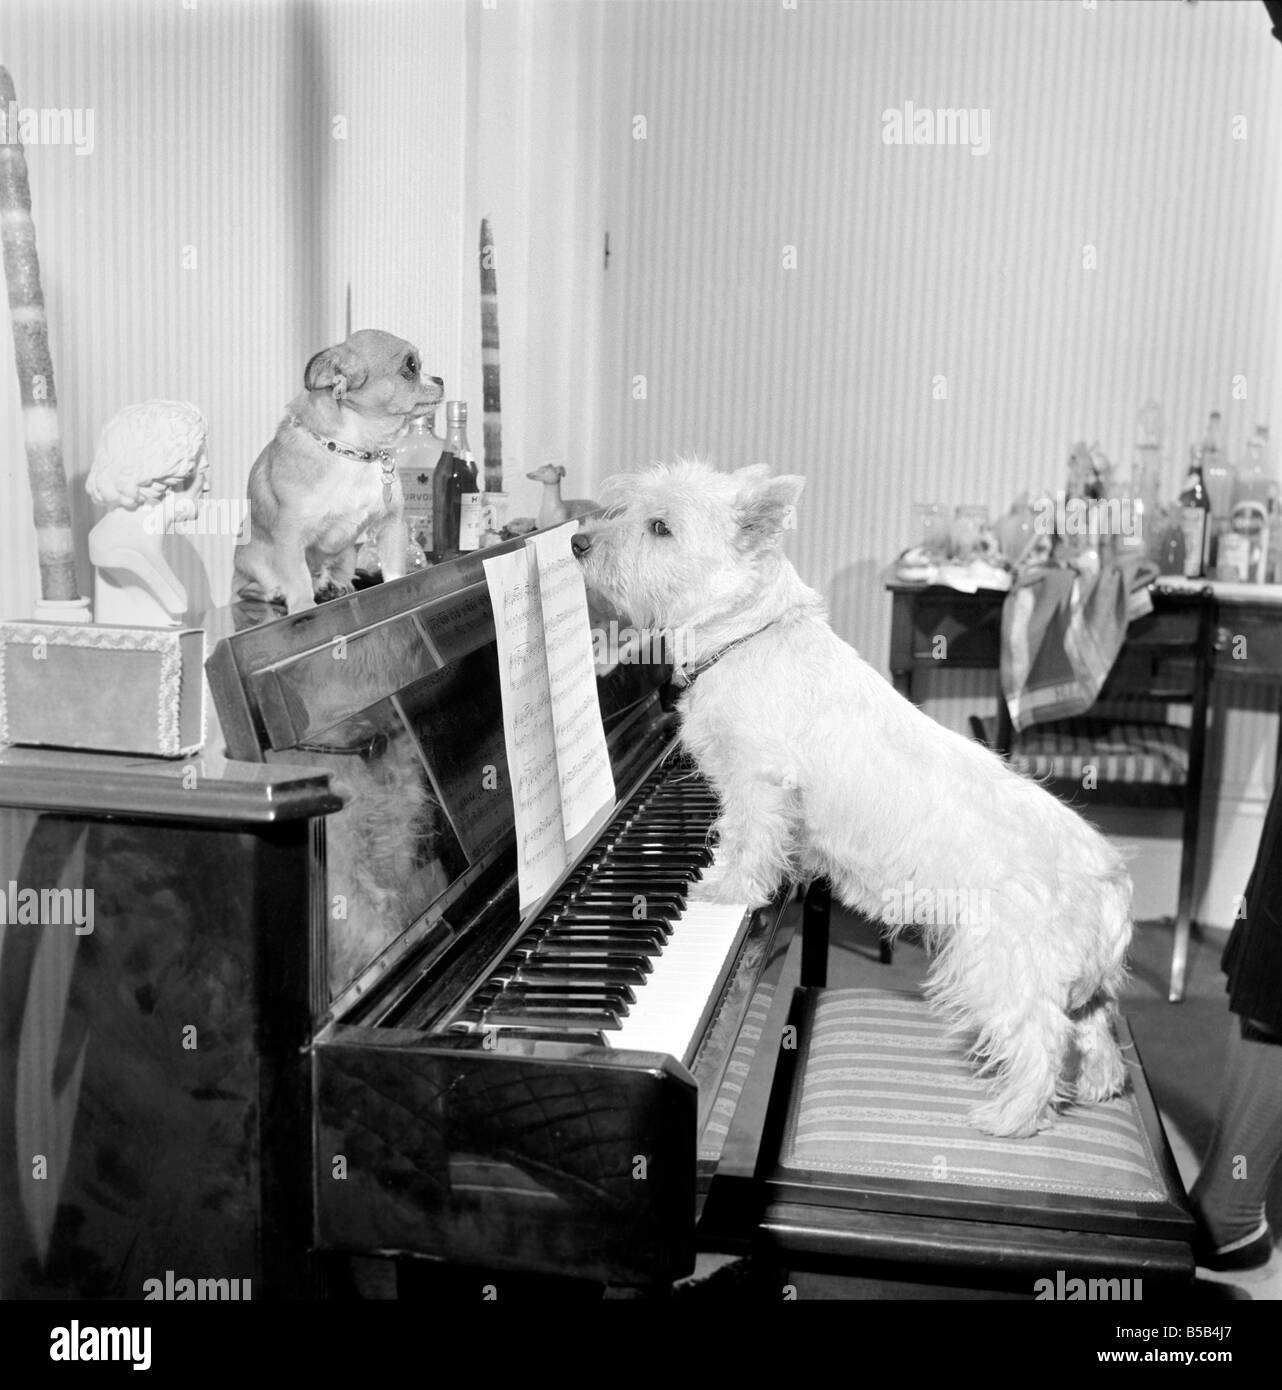 1960s Dog Stock Photos & 1960s Dog Stock Images - Alamy